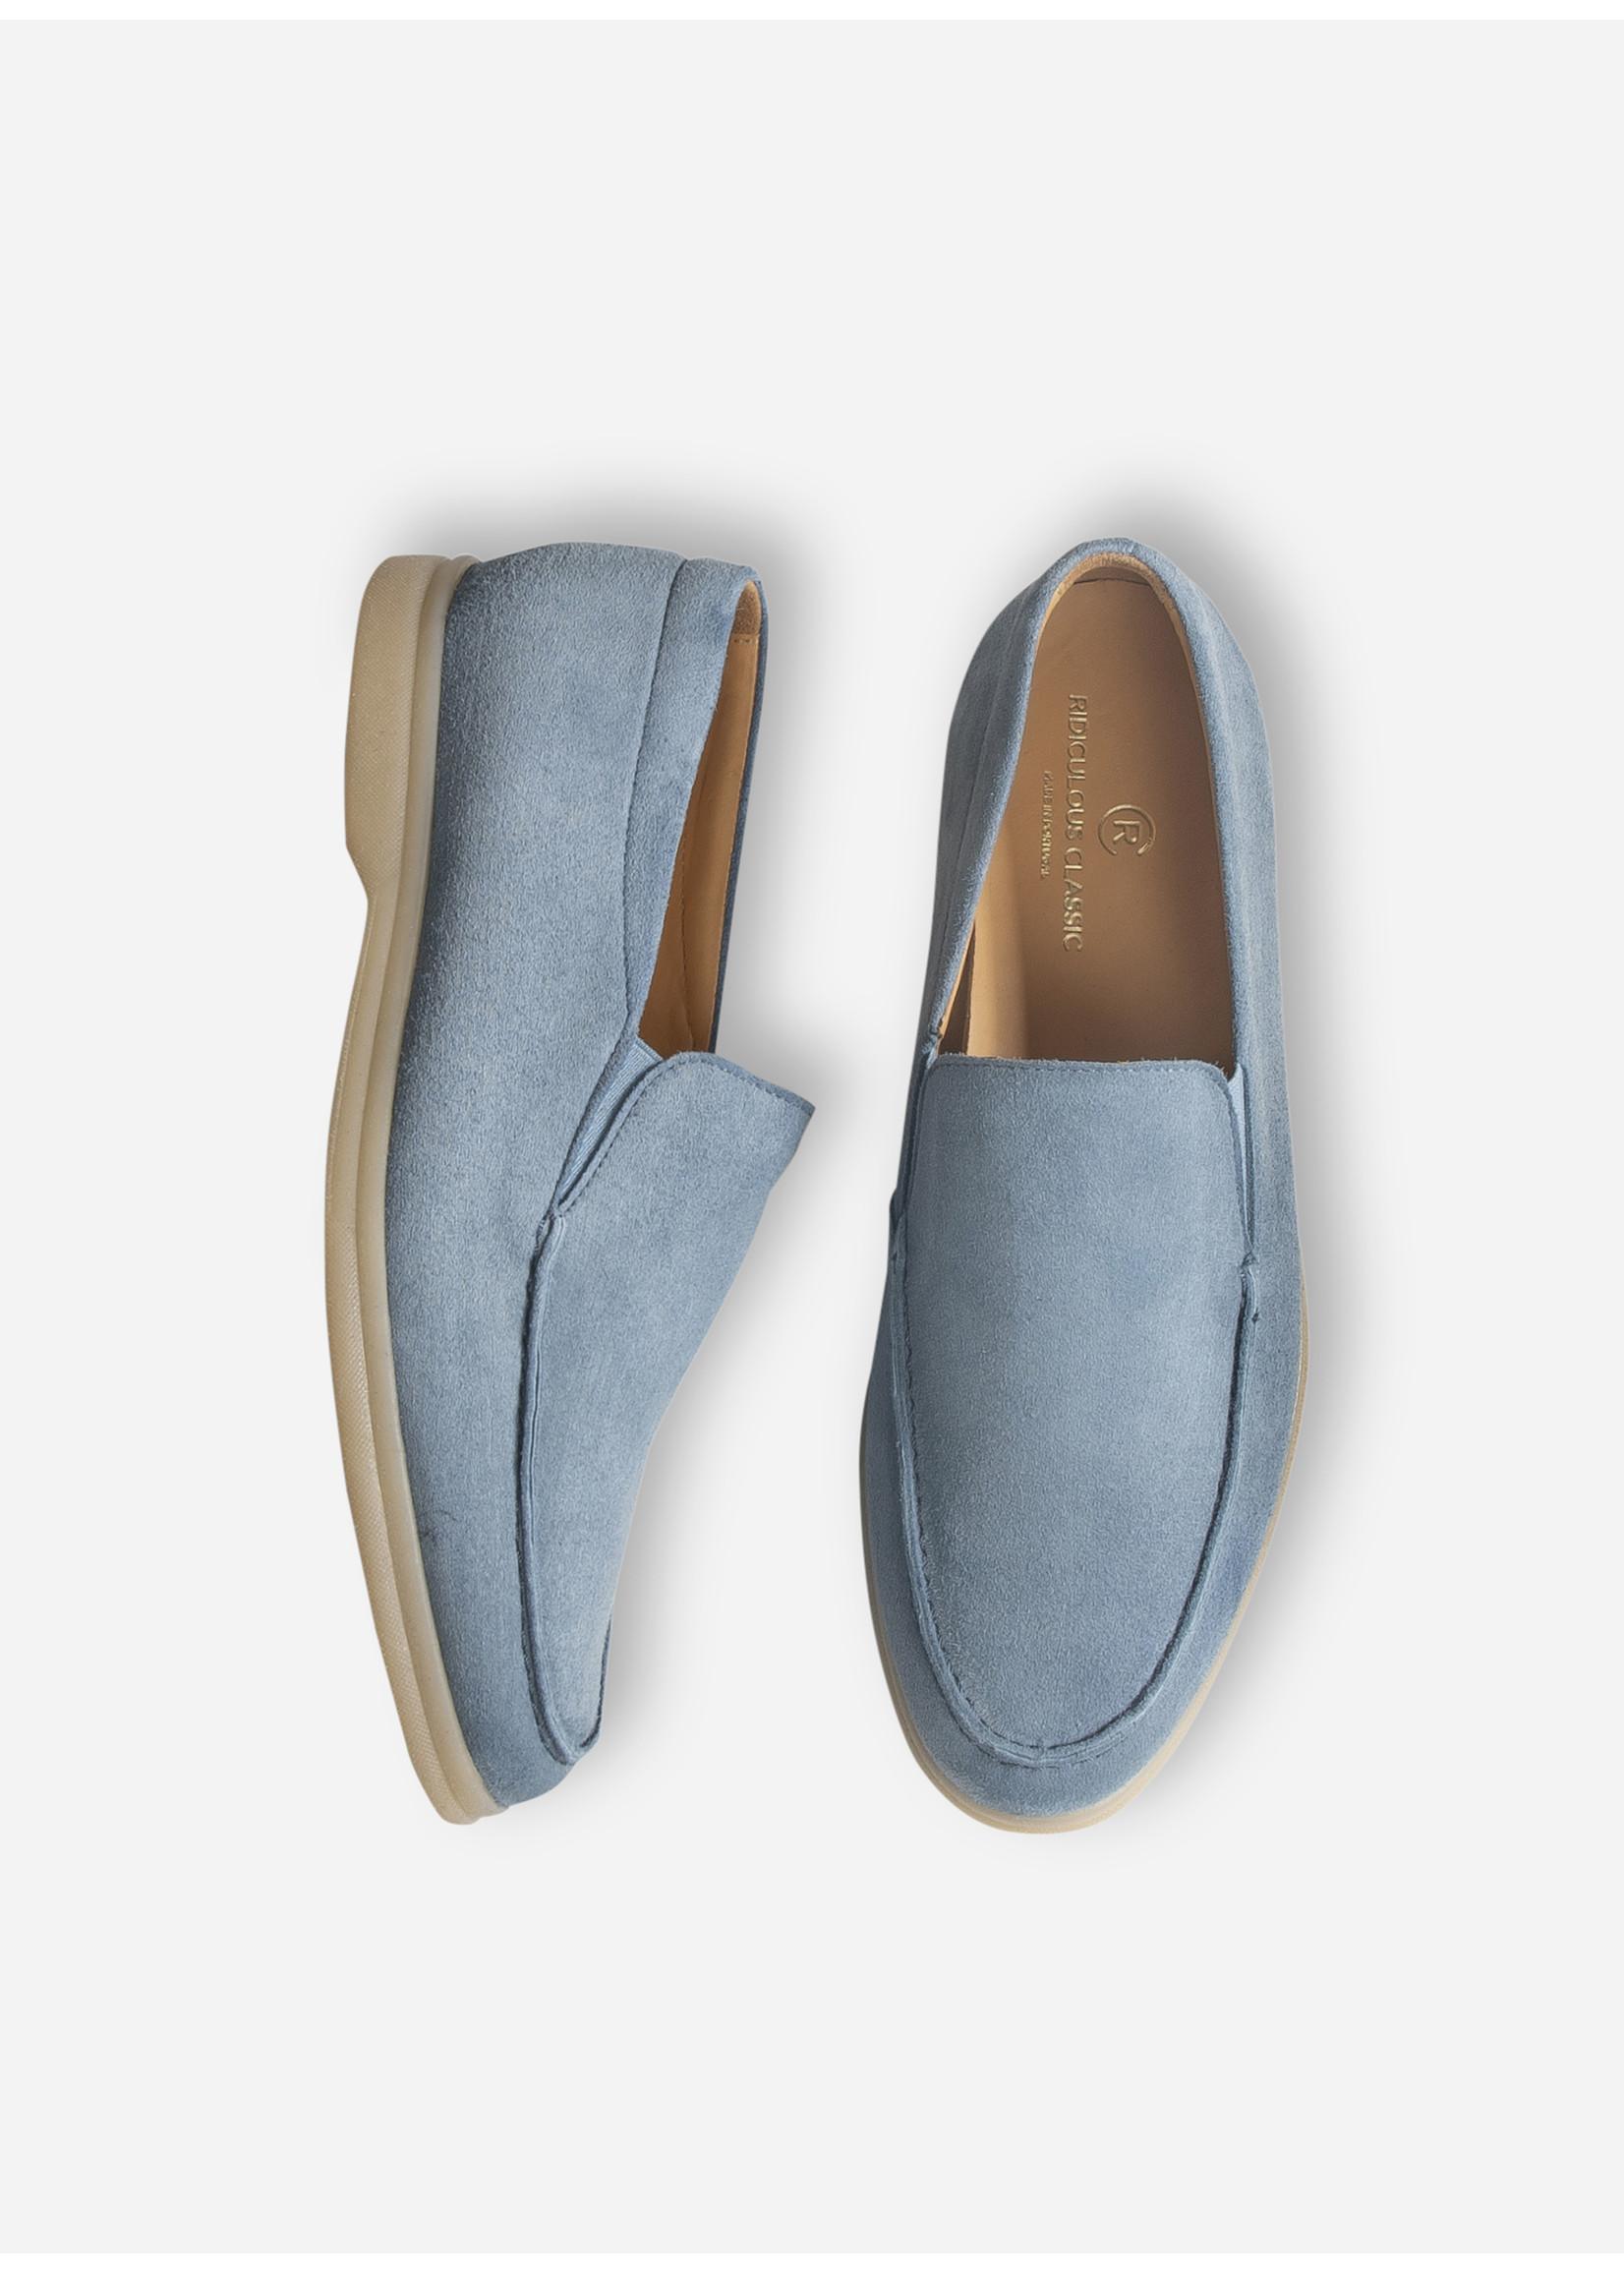 Ridiculous Classic Dock comfort low light blue